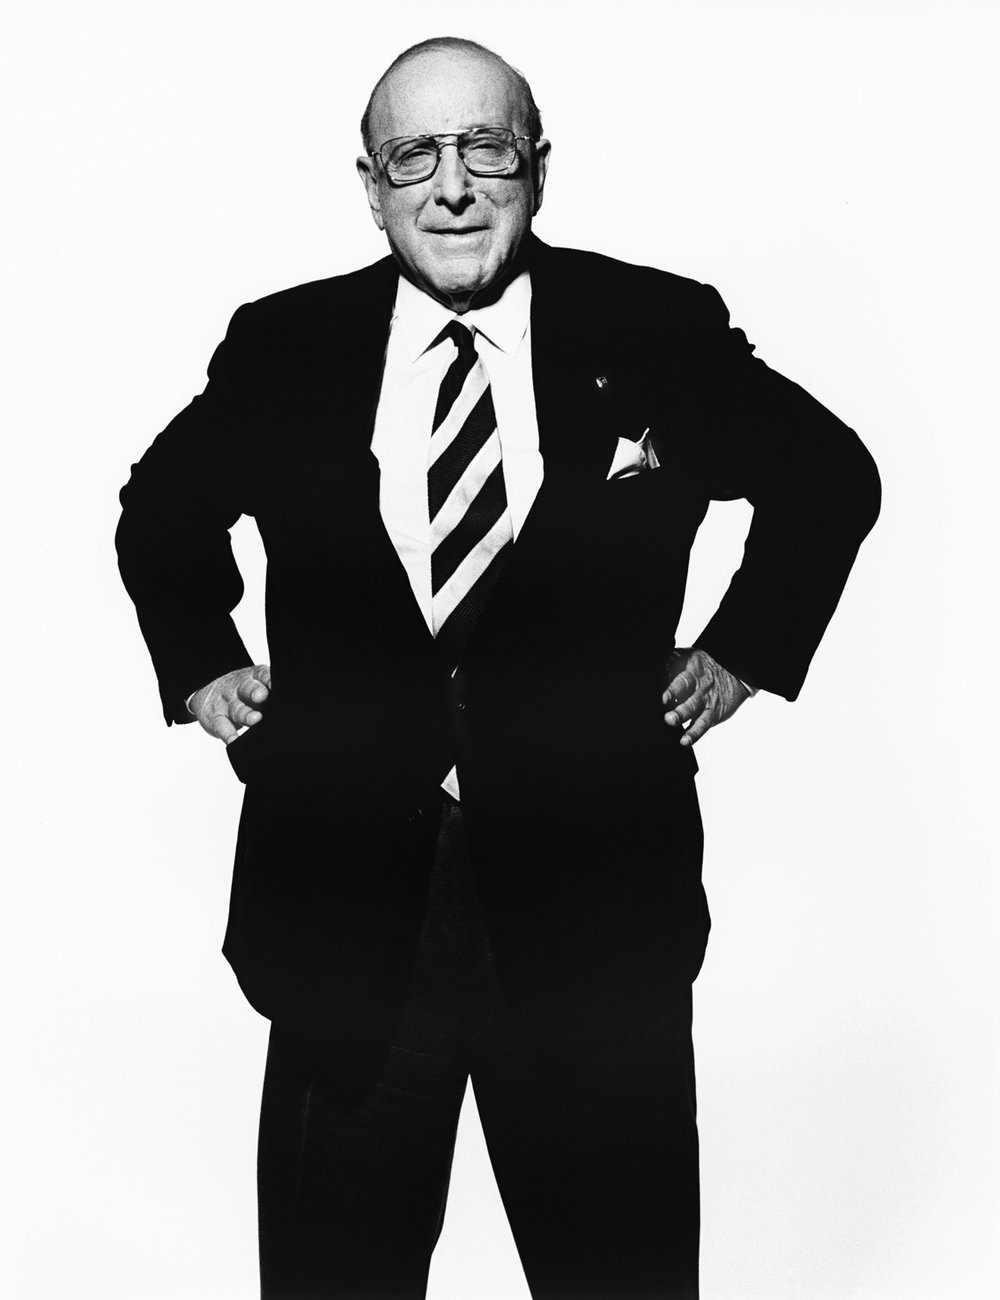 Clive Davis